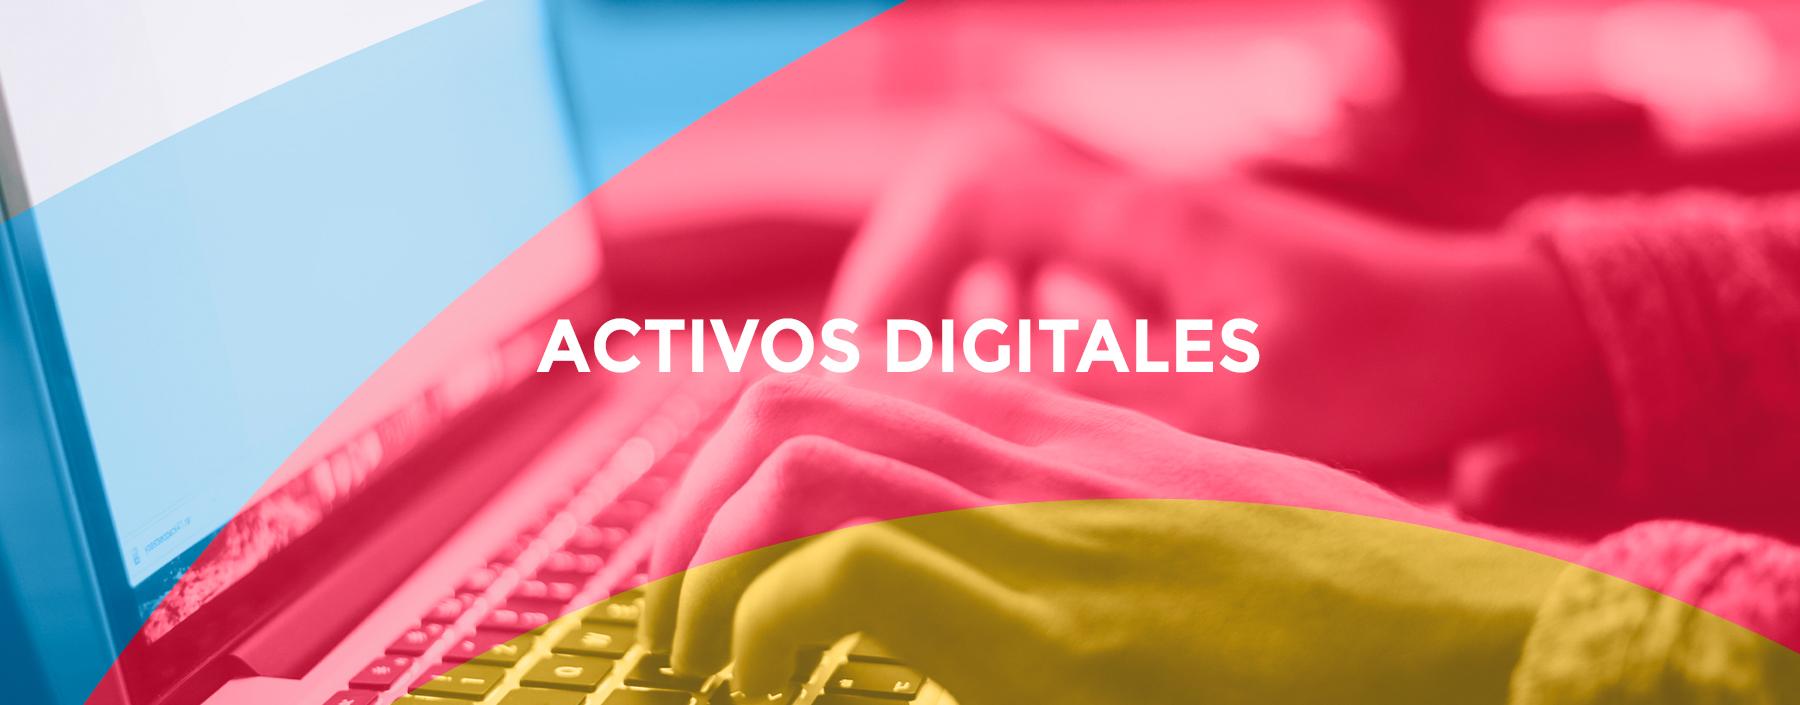 banner-activos-digitales